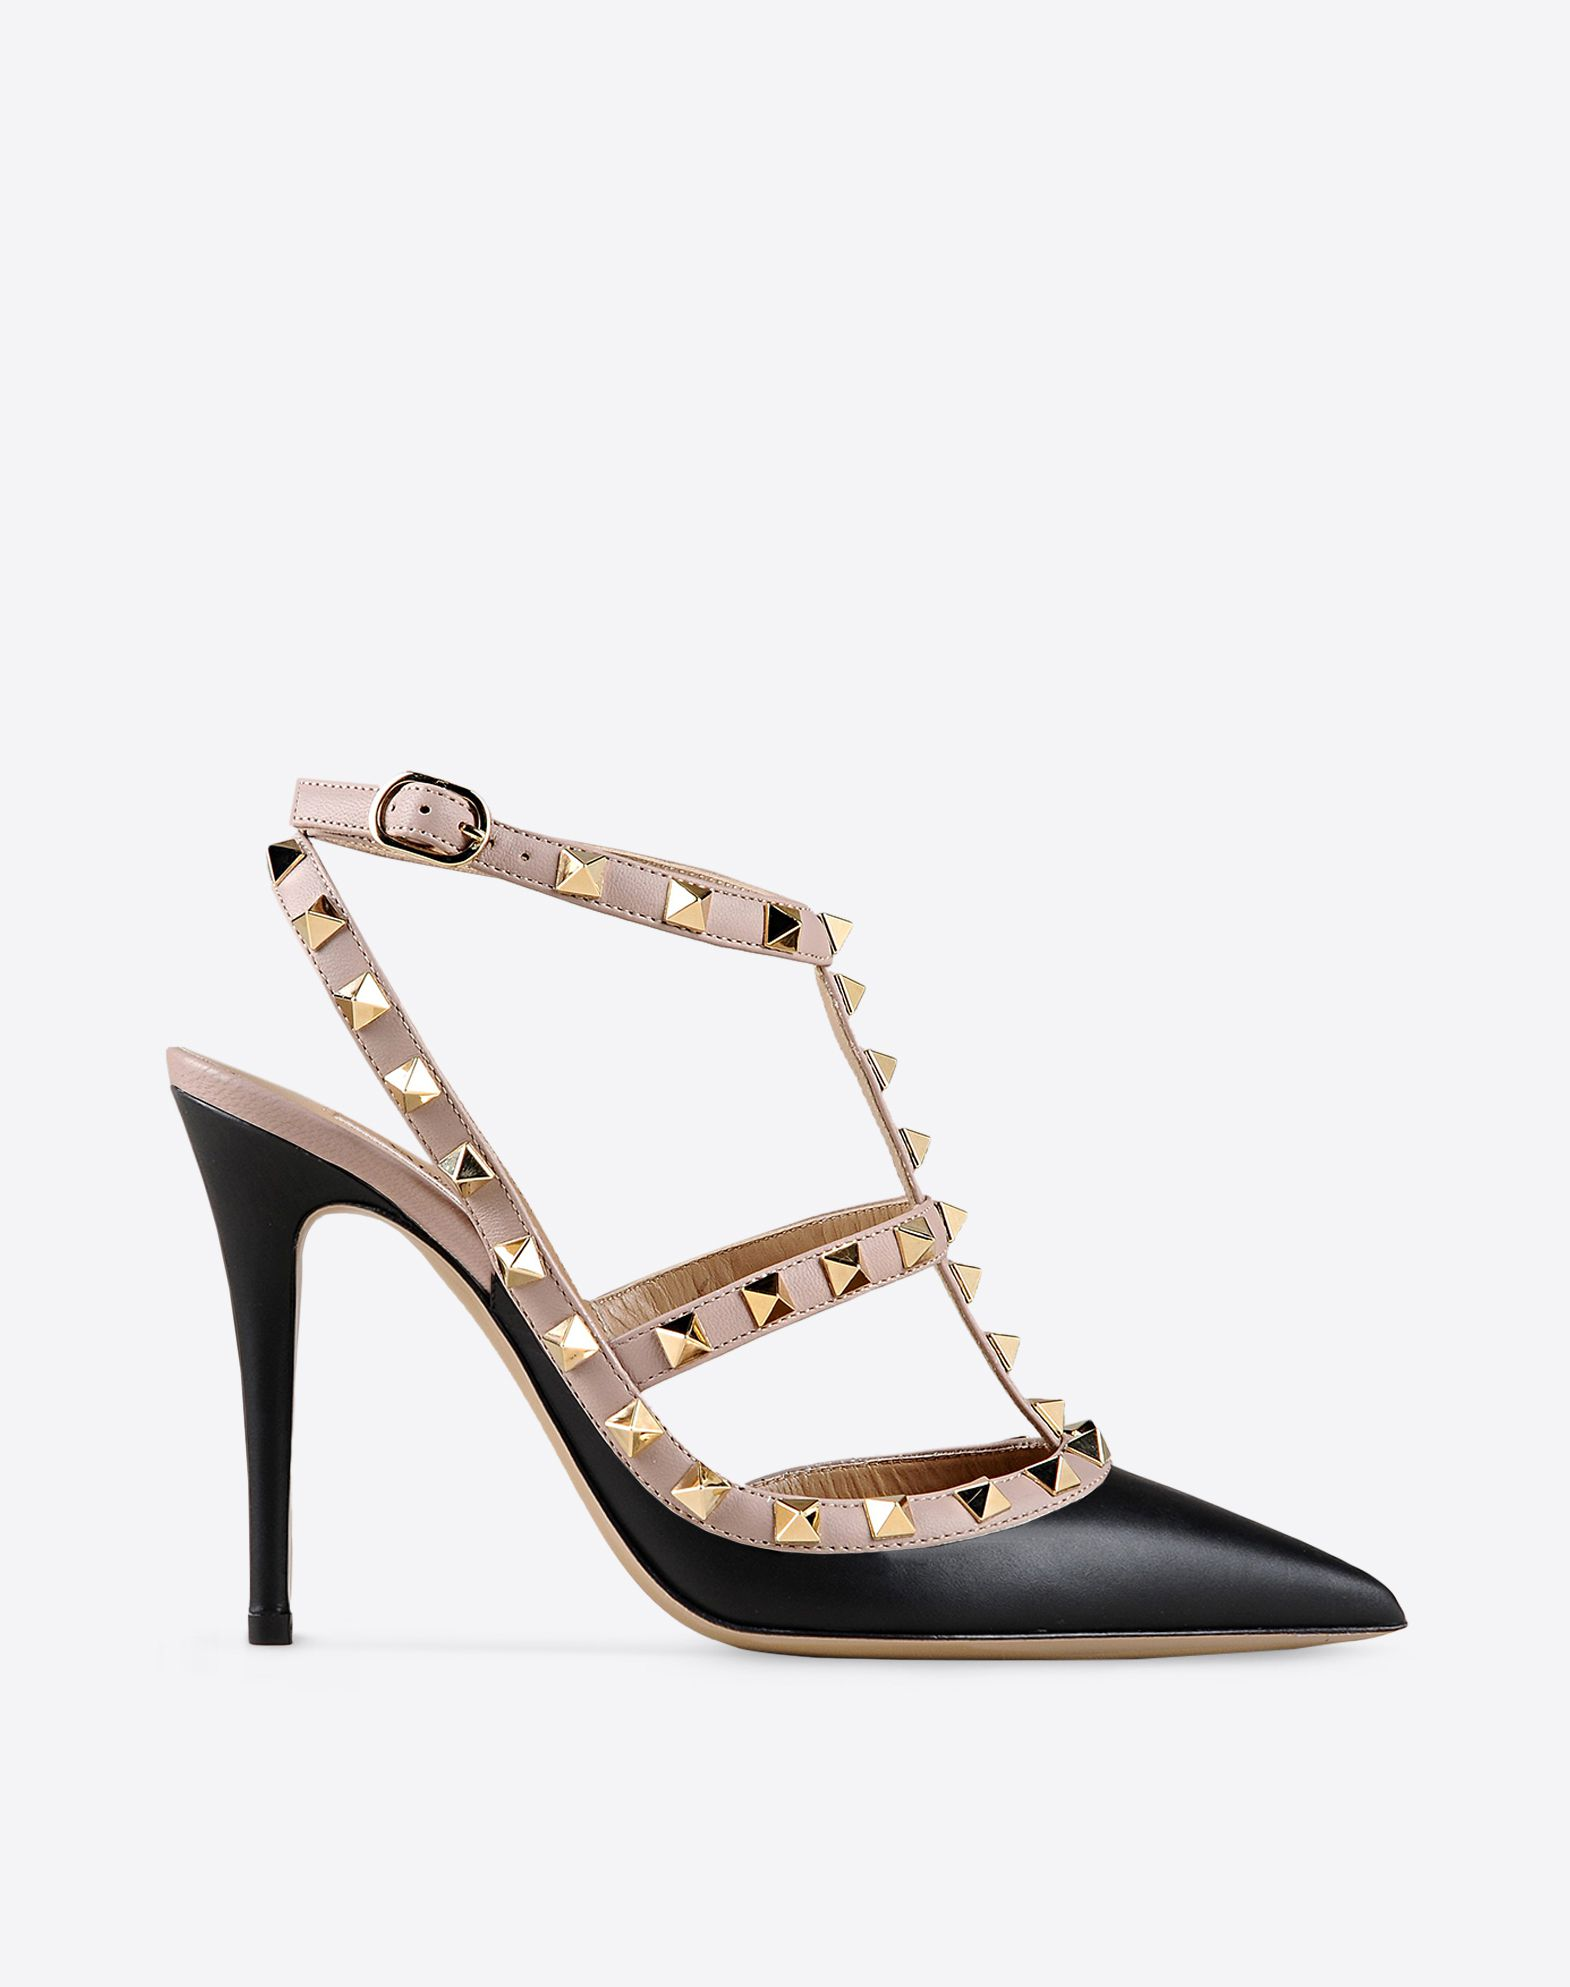 chaussure rockstud bride escarpin femme valentino garavani boutique en ligne valentino. Black Bedroom Furniture Sets. Home Design Ideas